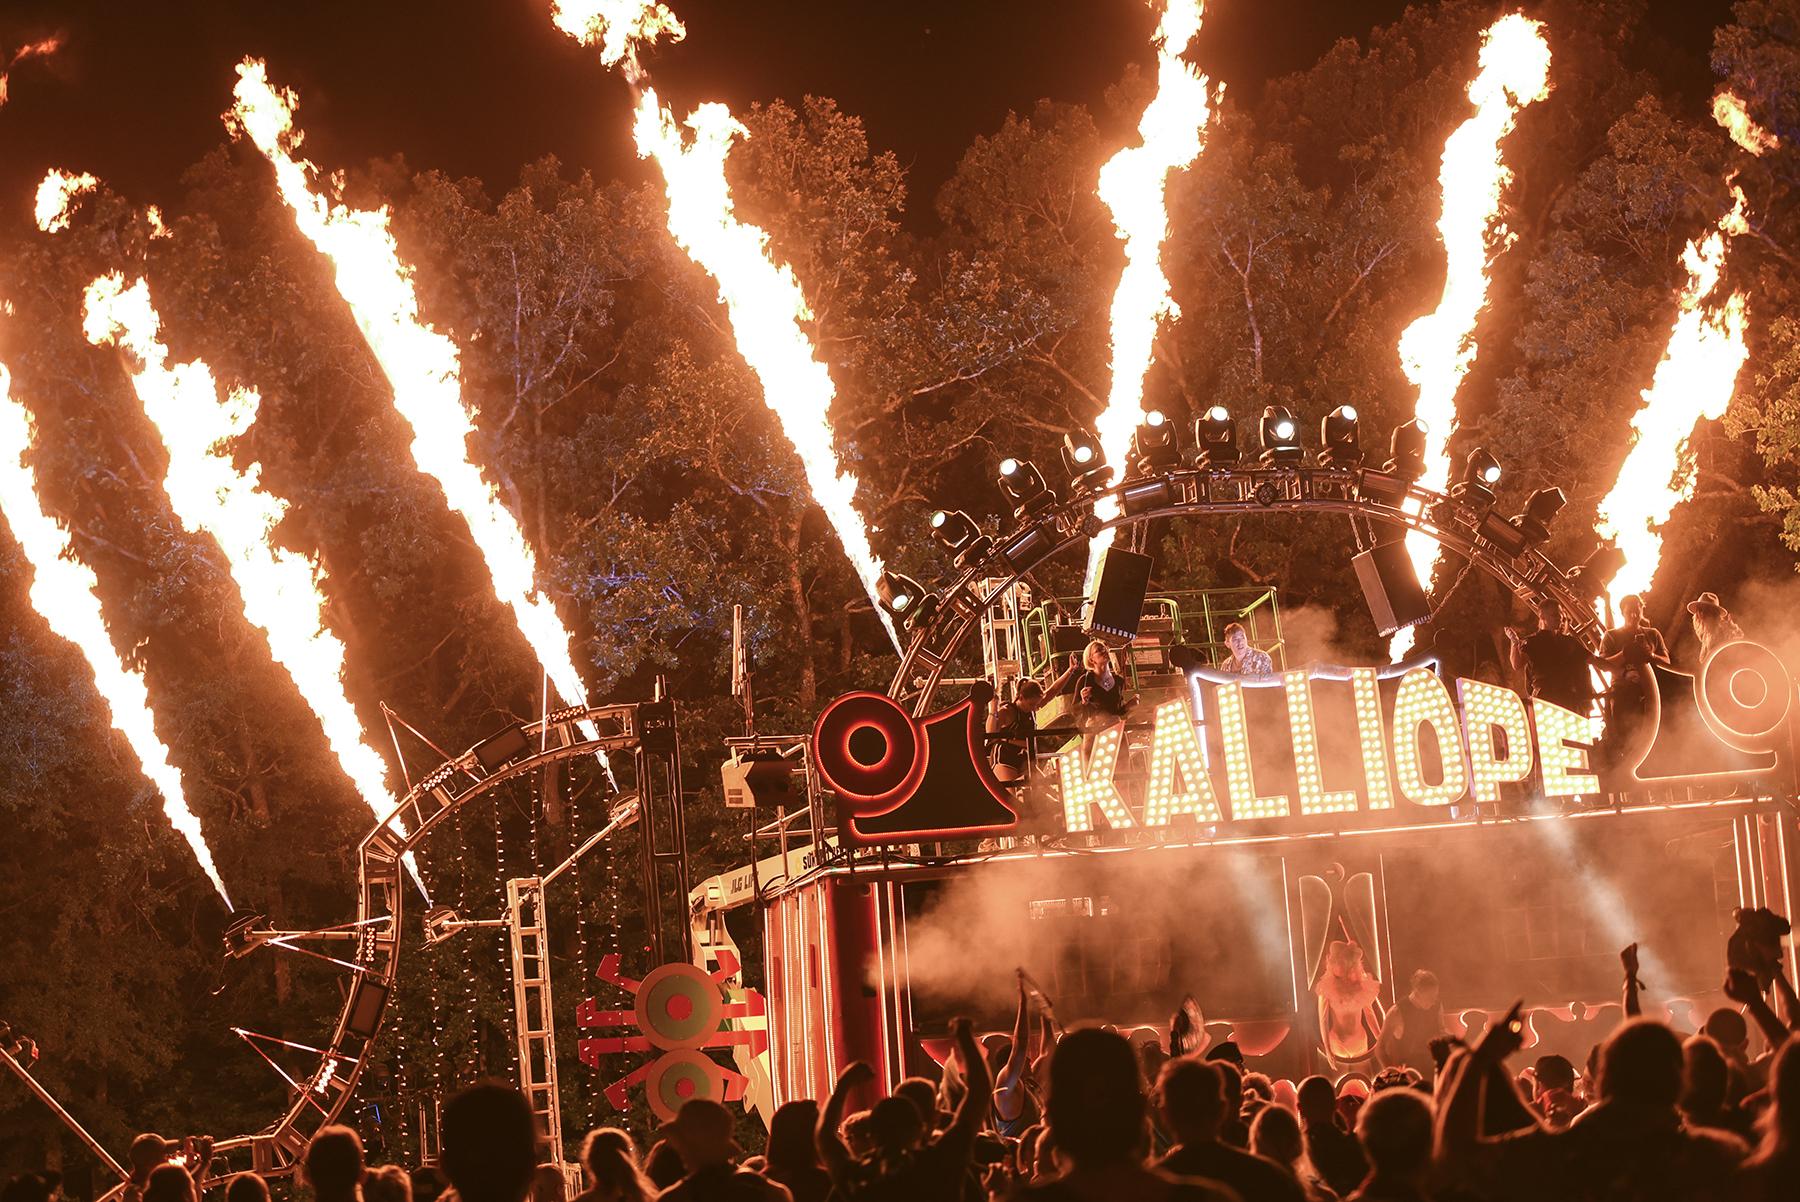 Kalliope_01web.jpg